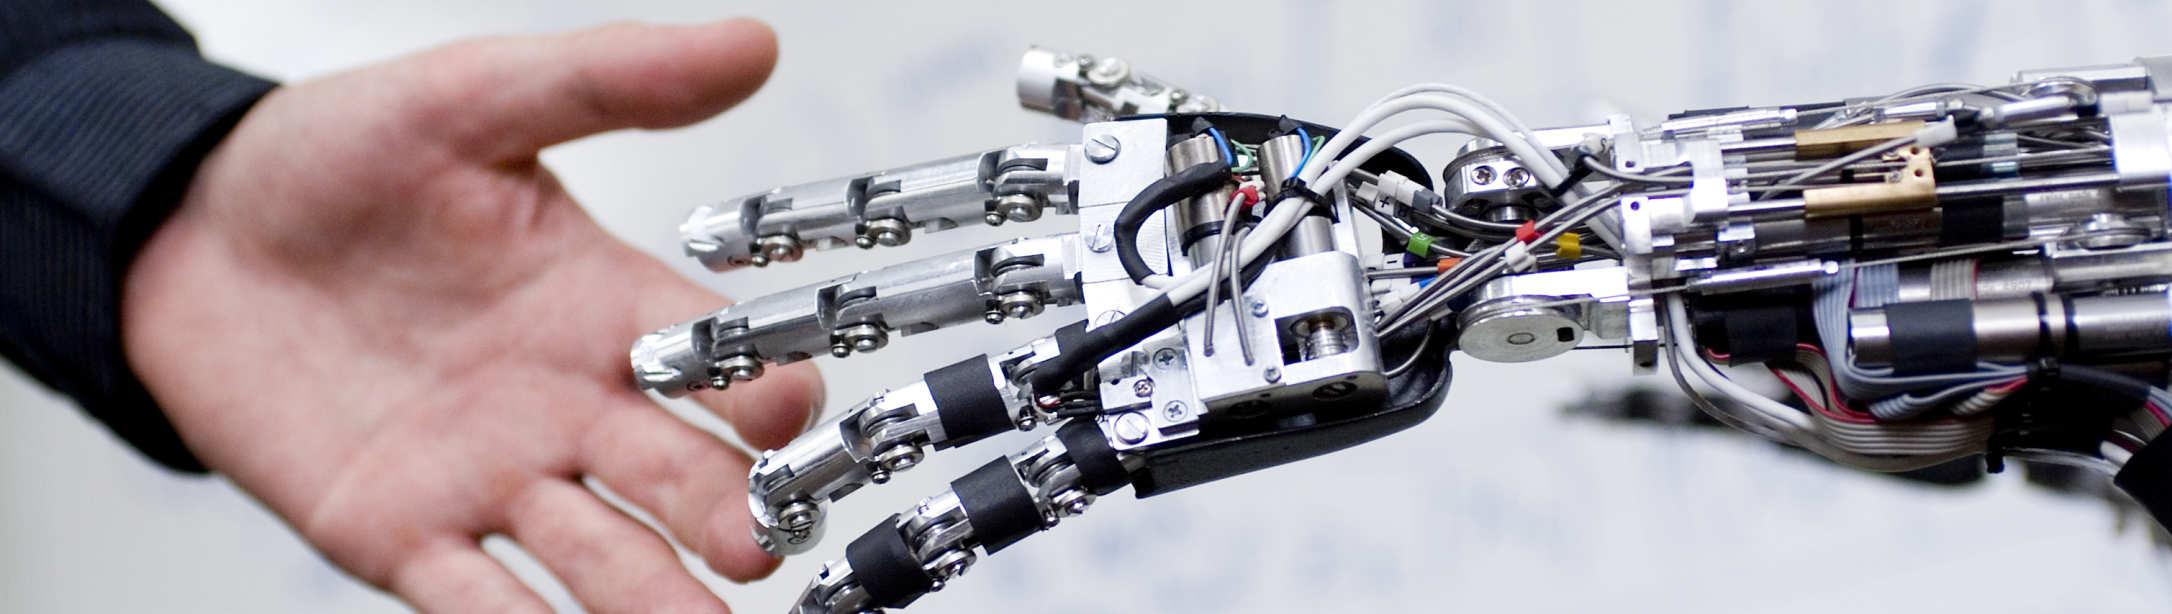 Robotics And Automation Wmm Group